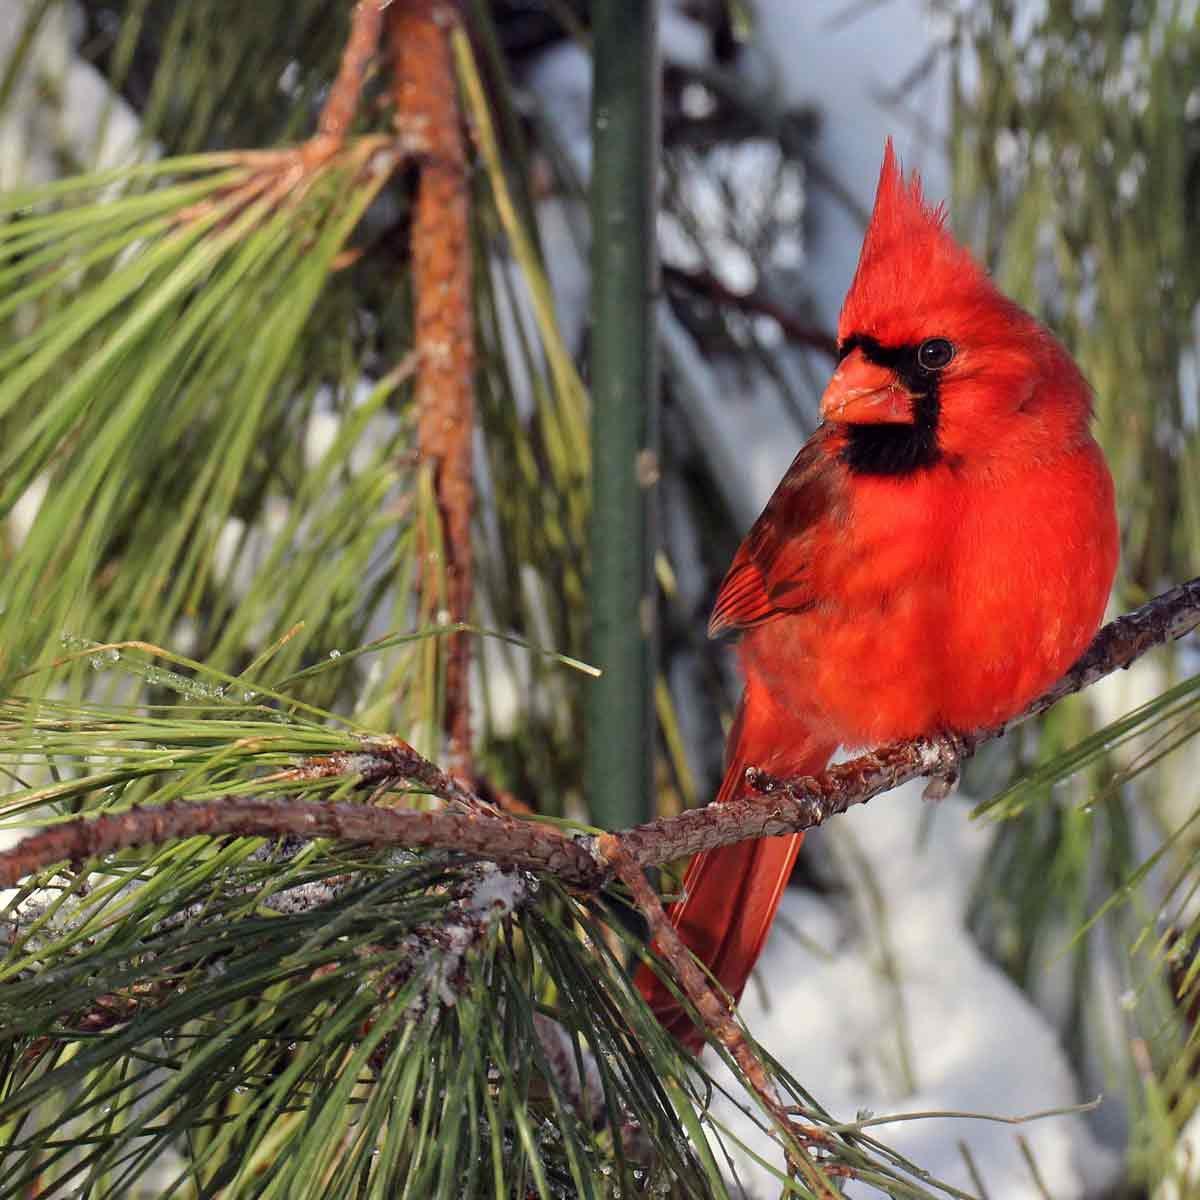 Cardinal-sitting-on-a-pine-tree-branch